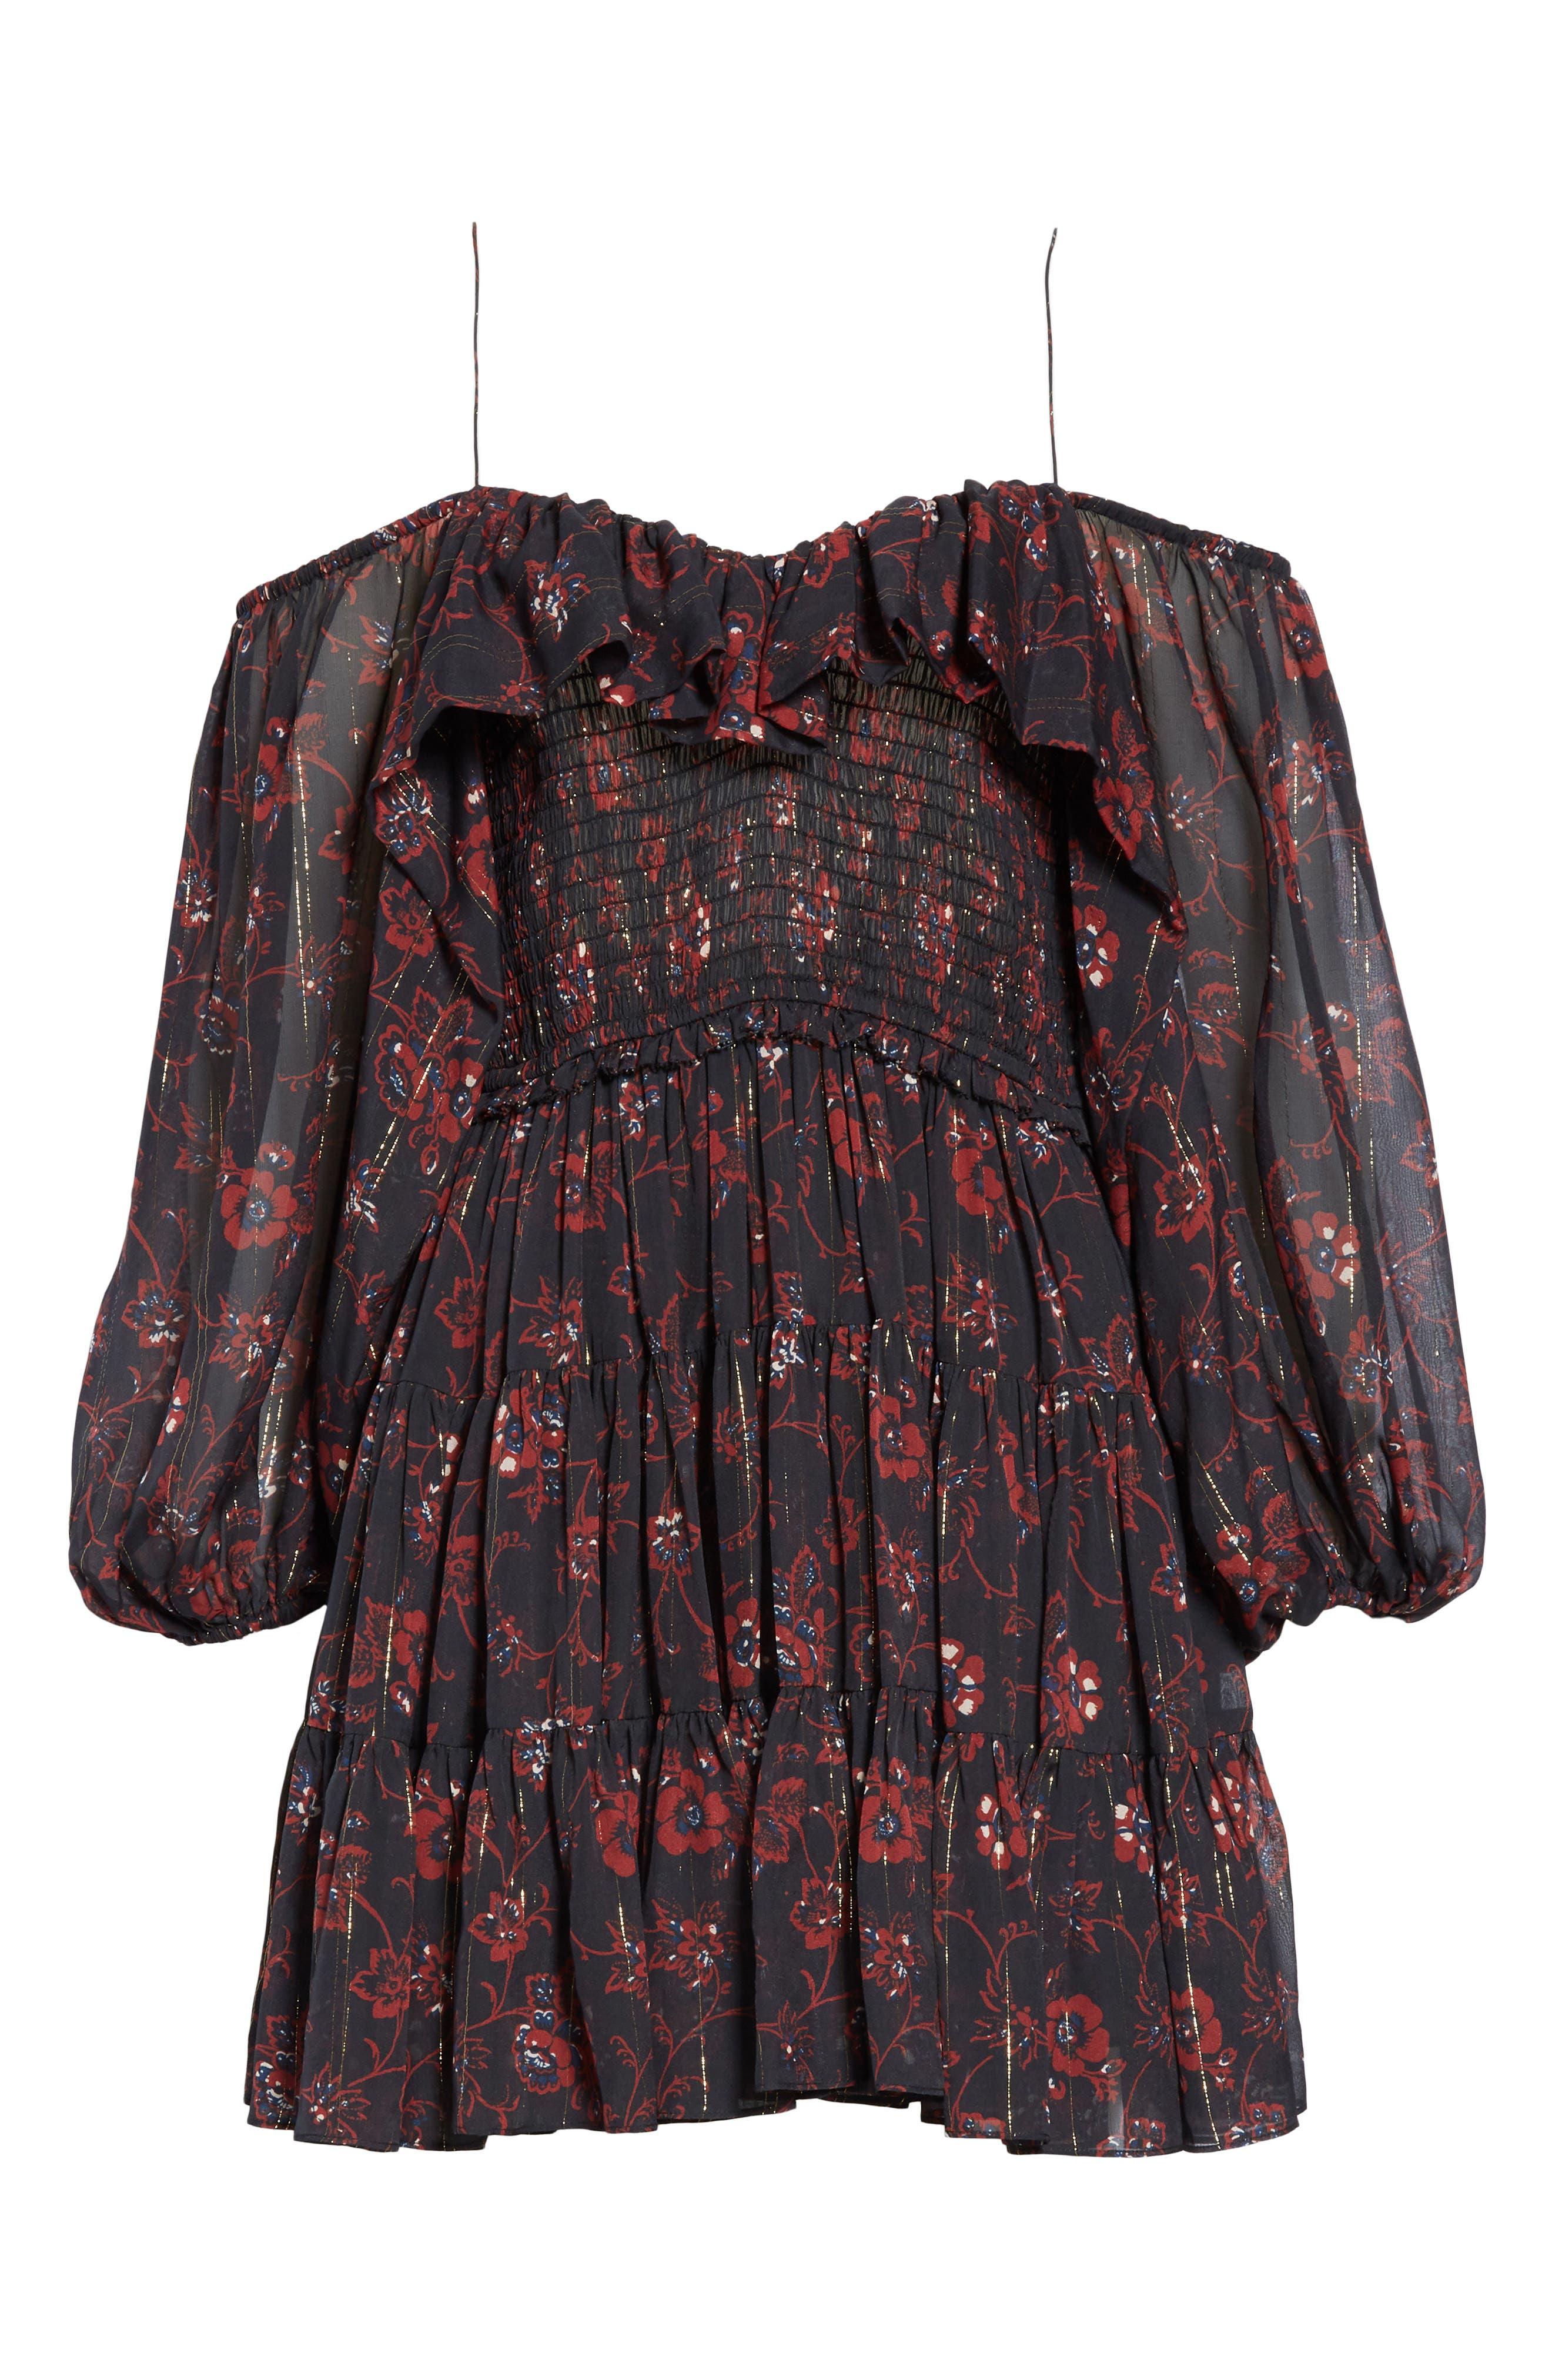 Monet Metallic Floral Cold Shoulder Silk Blend Dress,                             Alternate thumbnail 7, color,                             NOIR